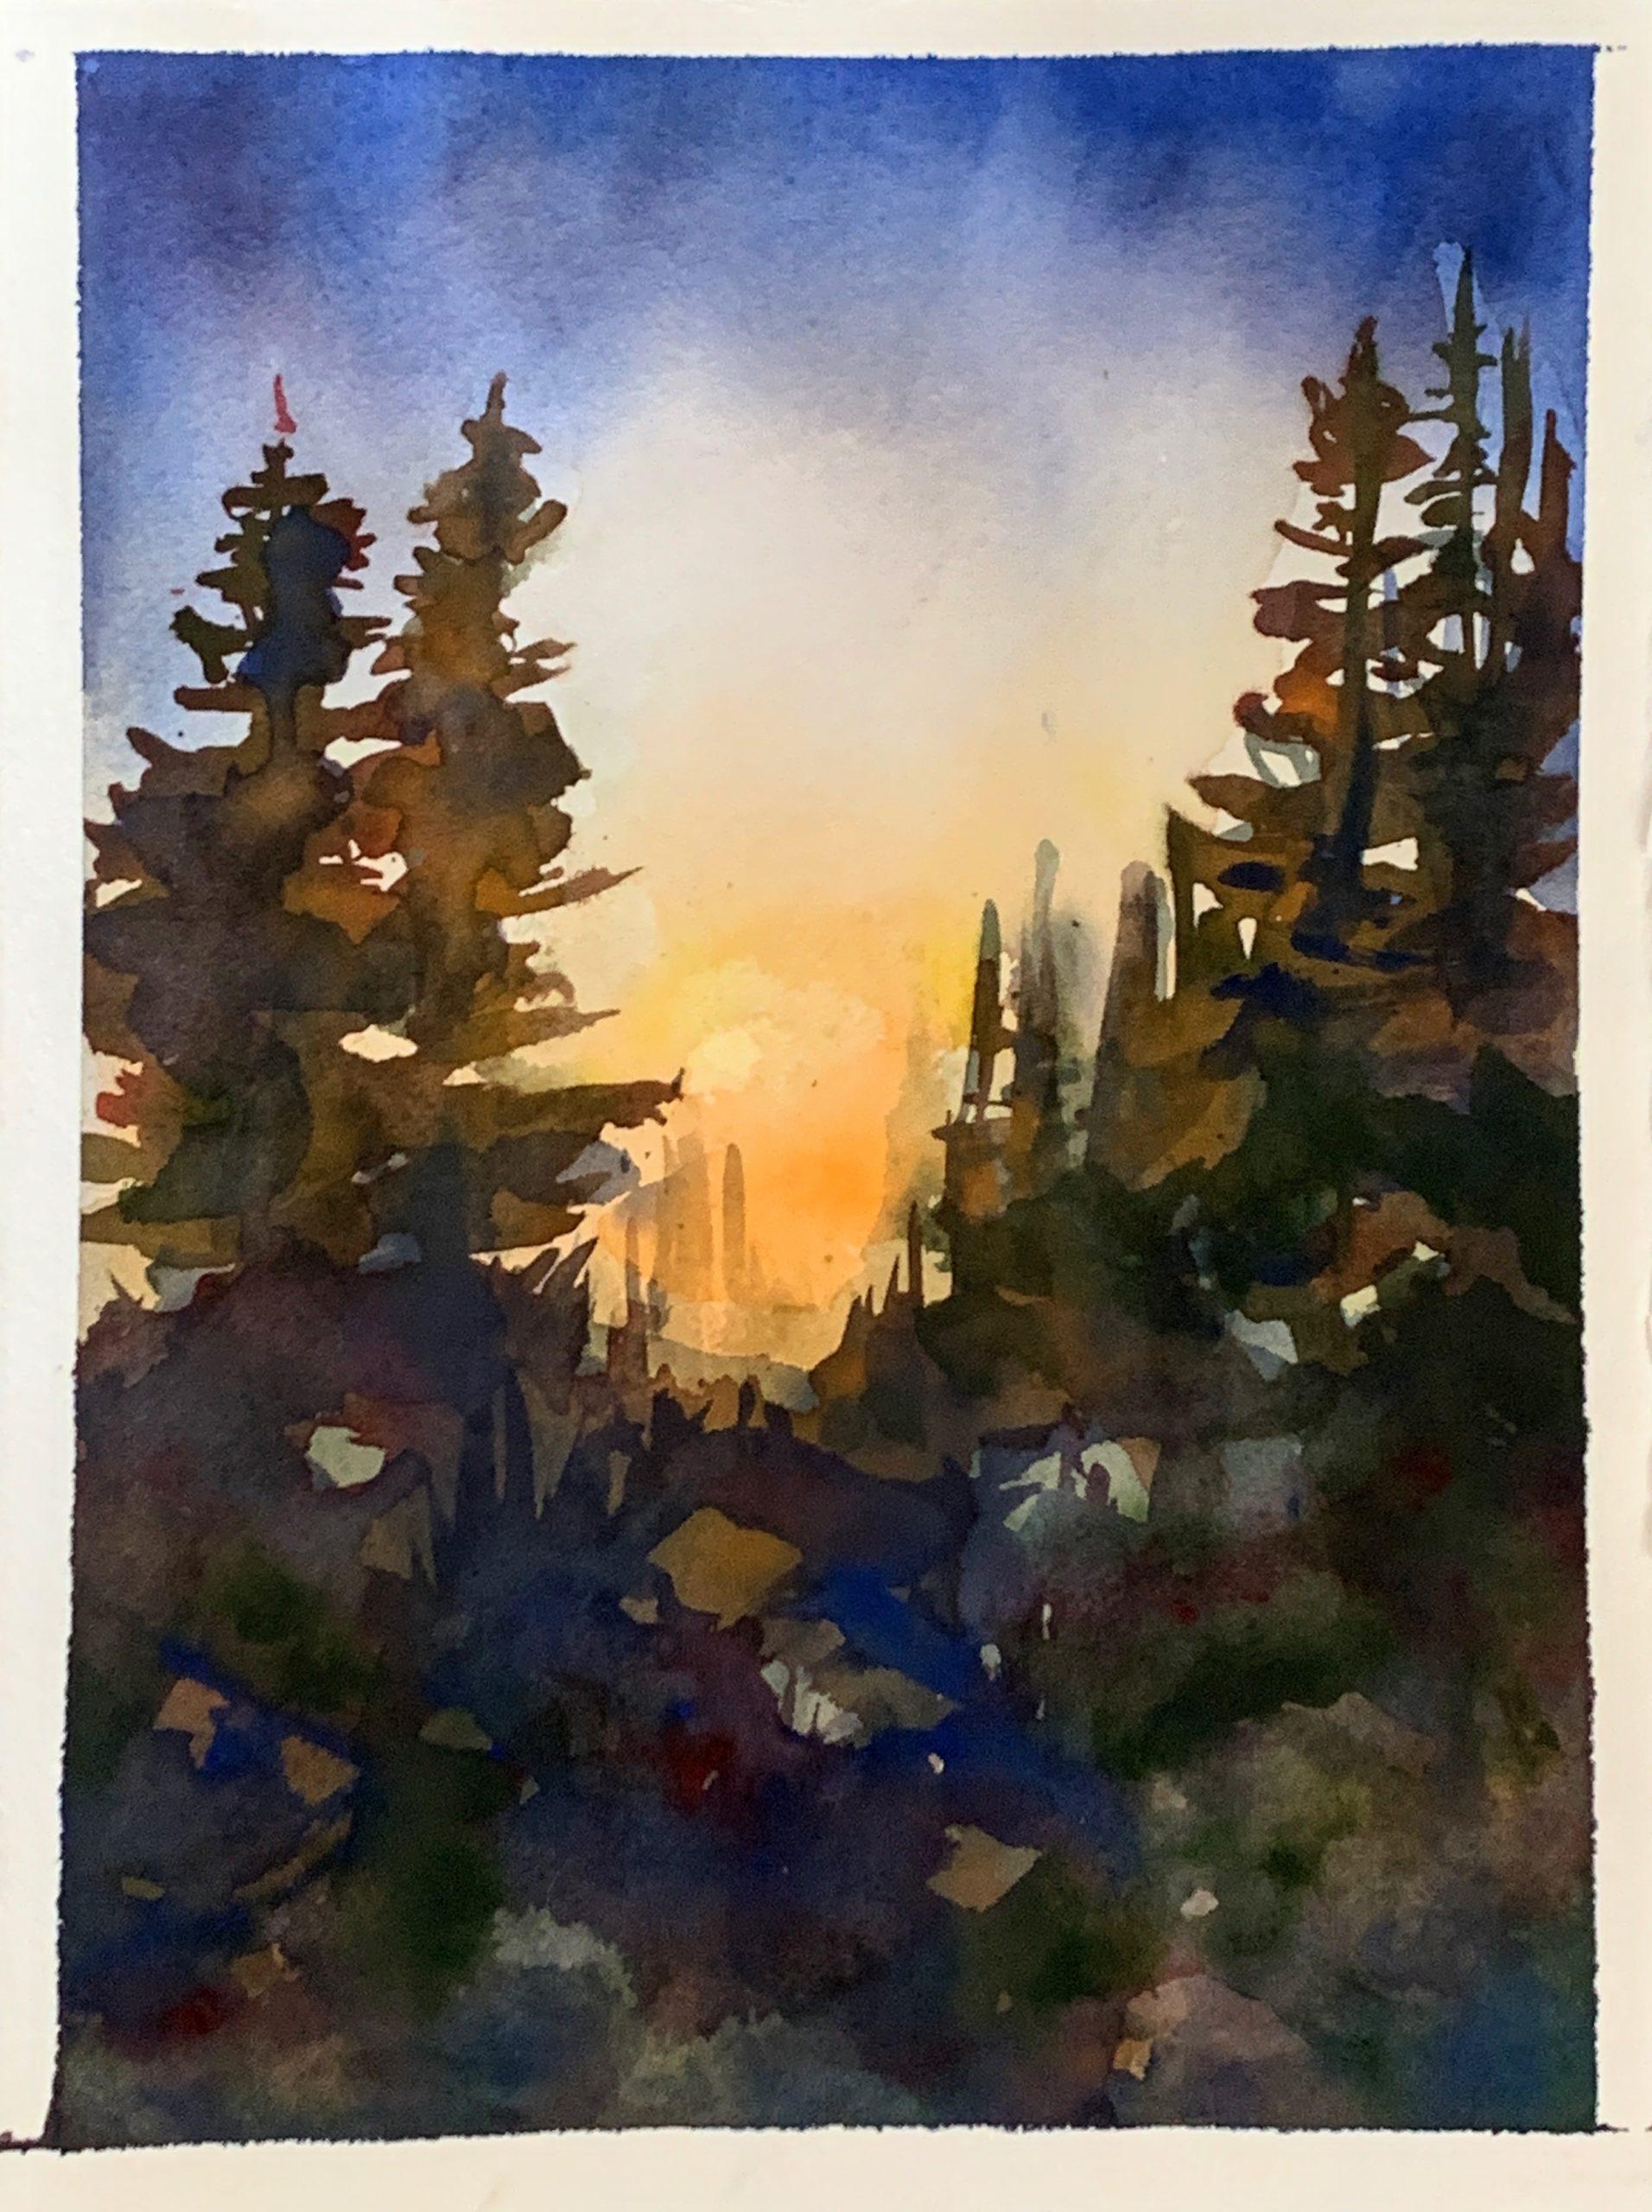 Watercolor ~ Colorado Sunset | The Loaded Brush Paint & Sip Classes | loadedbrushpdx.com